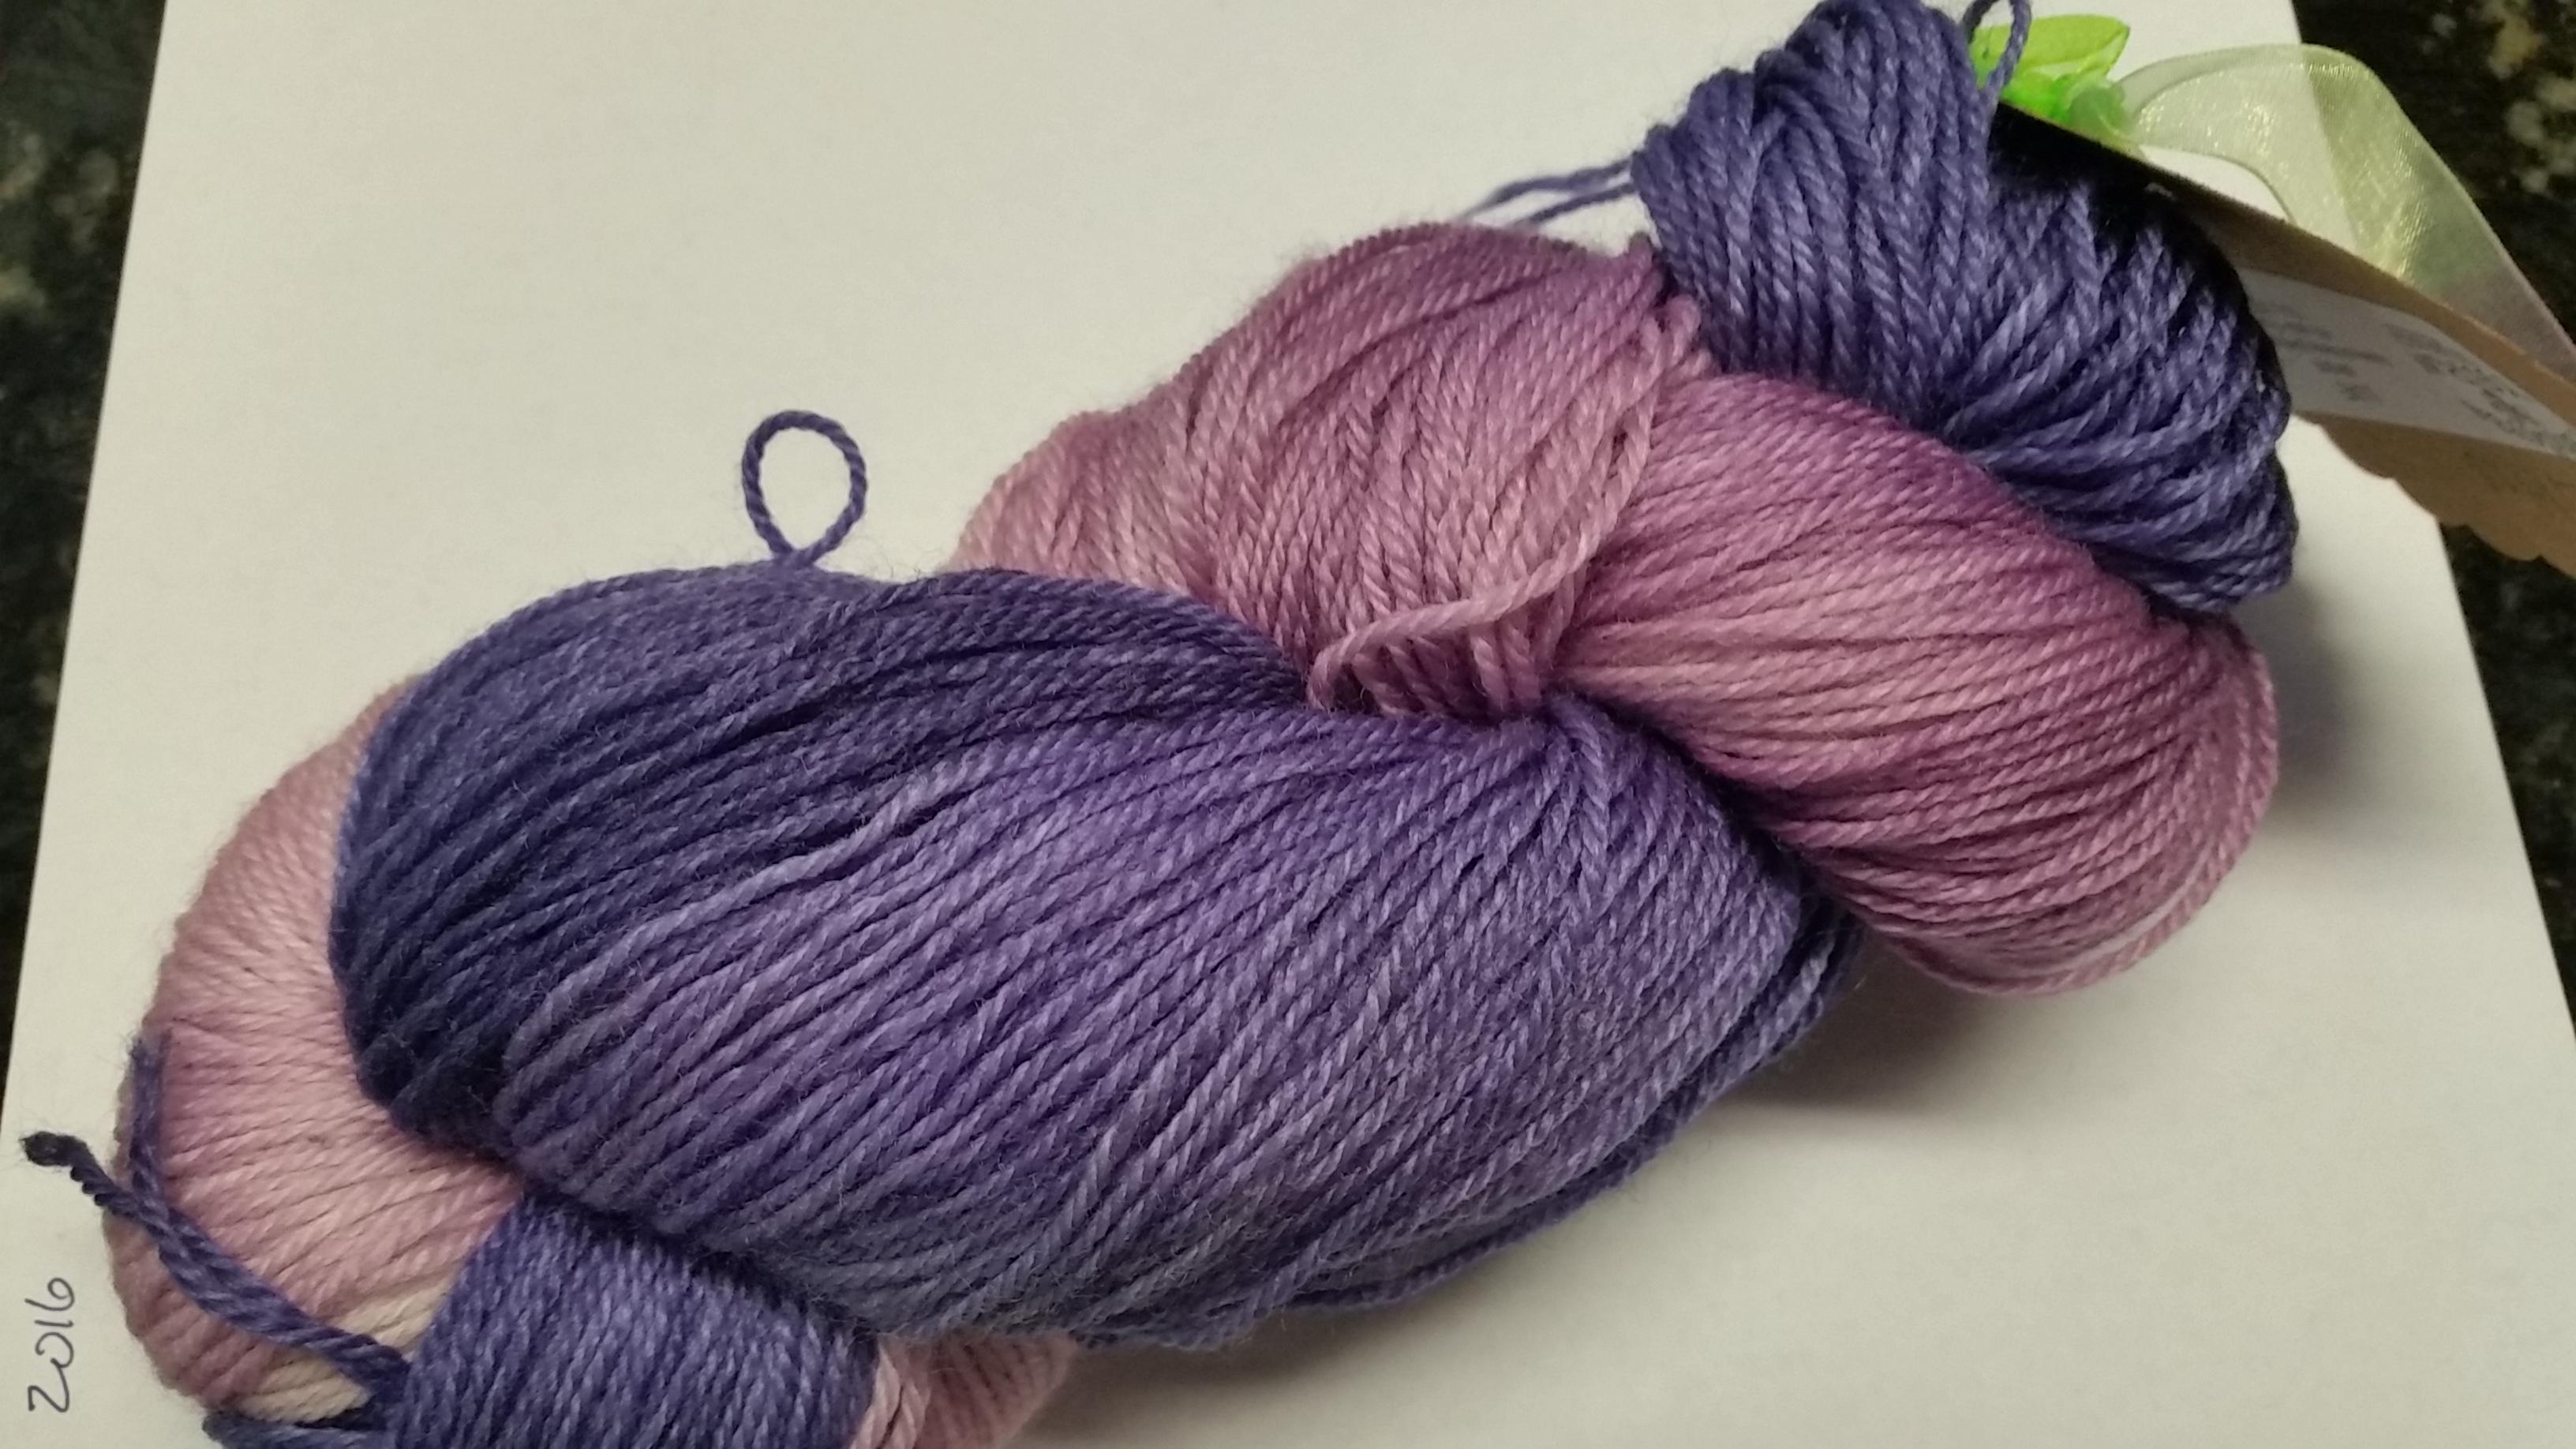 Pandora's Yarn Luxe sock yarn in Lilacs